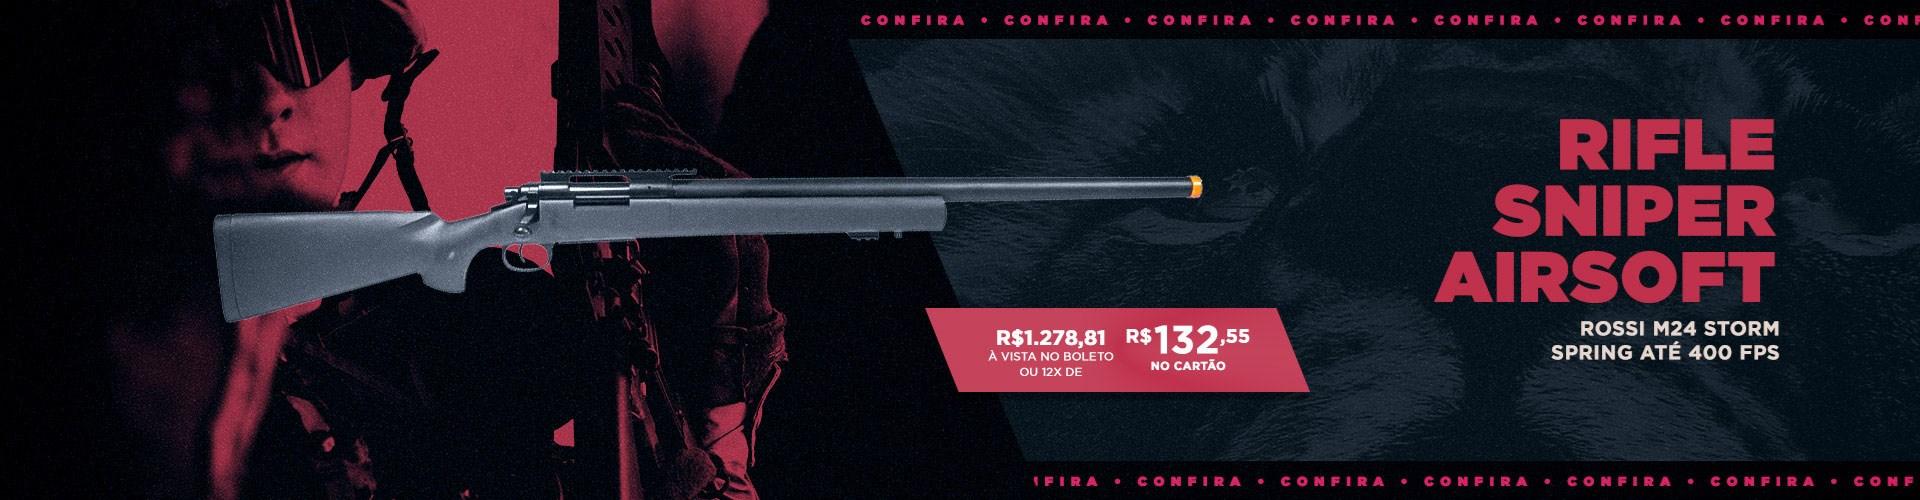 Rifle Sniper Airsoft Rossi M24 Storm